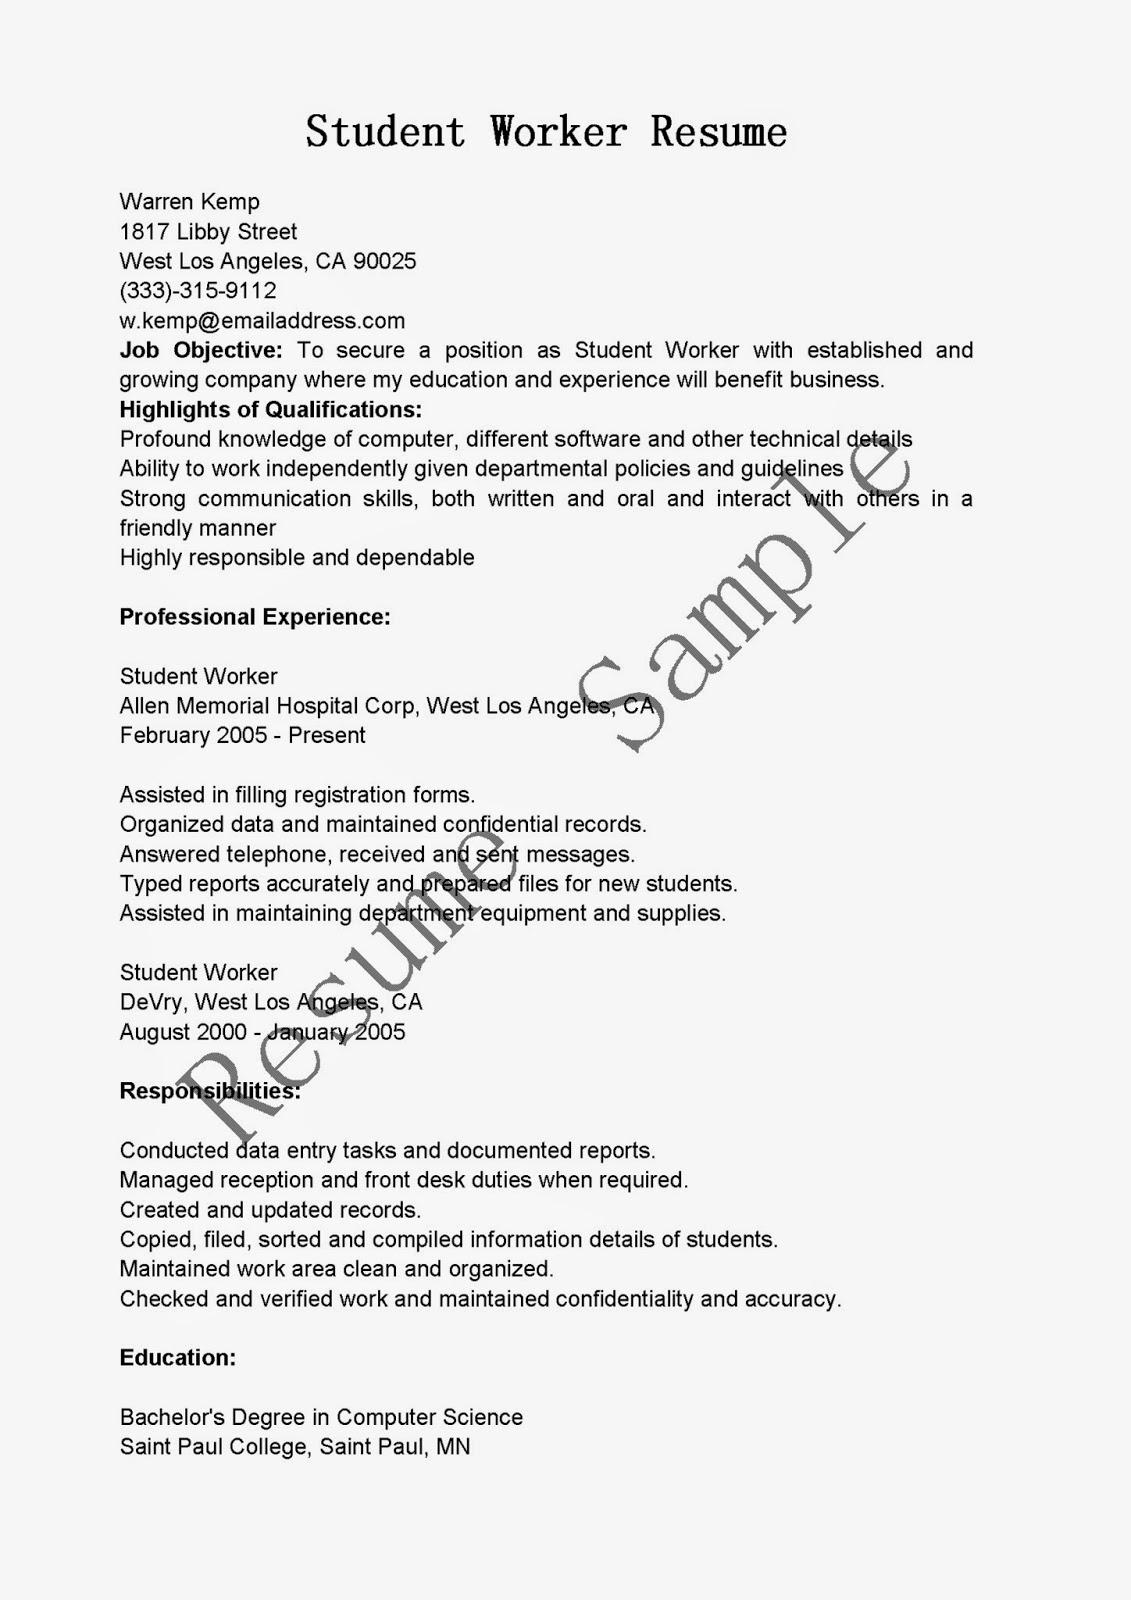 Resume Samples Student Worker Resume Sample